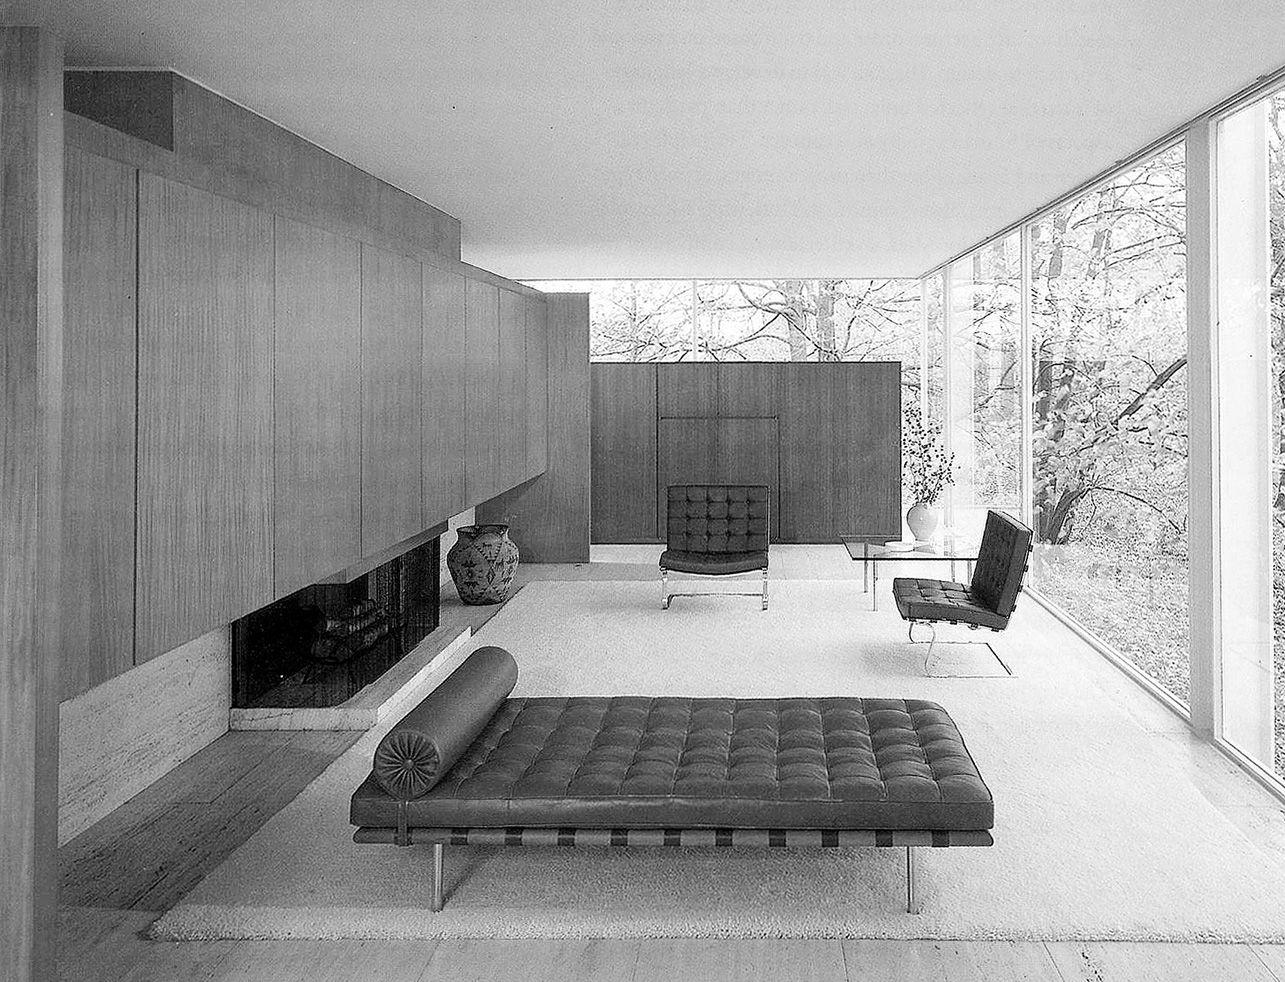 Homage to Mies van der Rohe | Farnsworth house, Interior